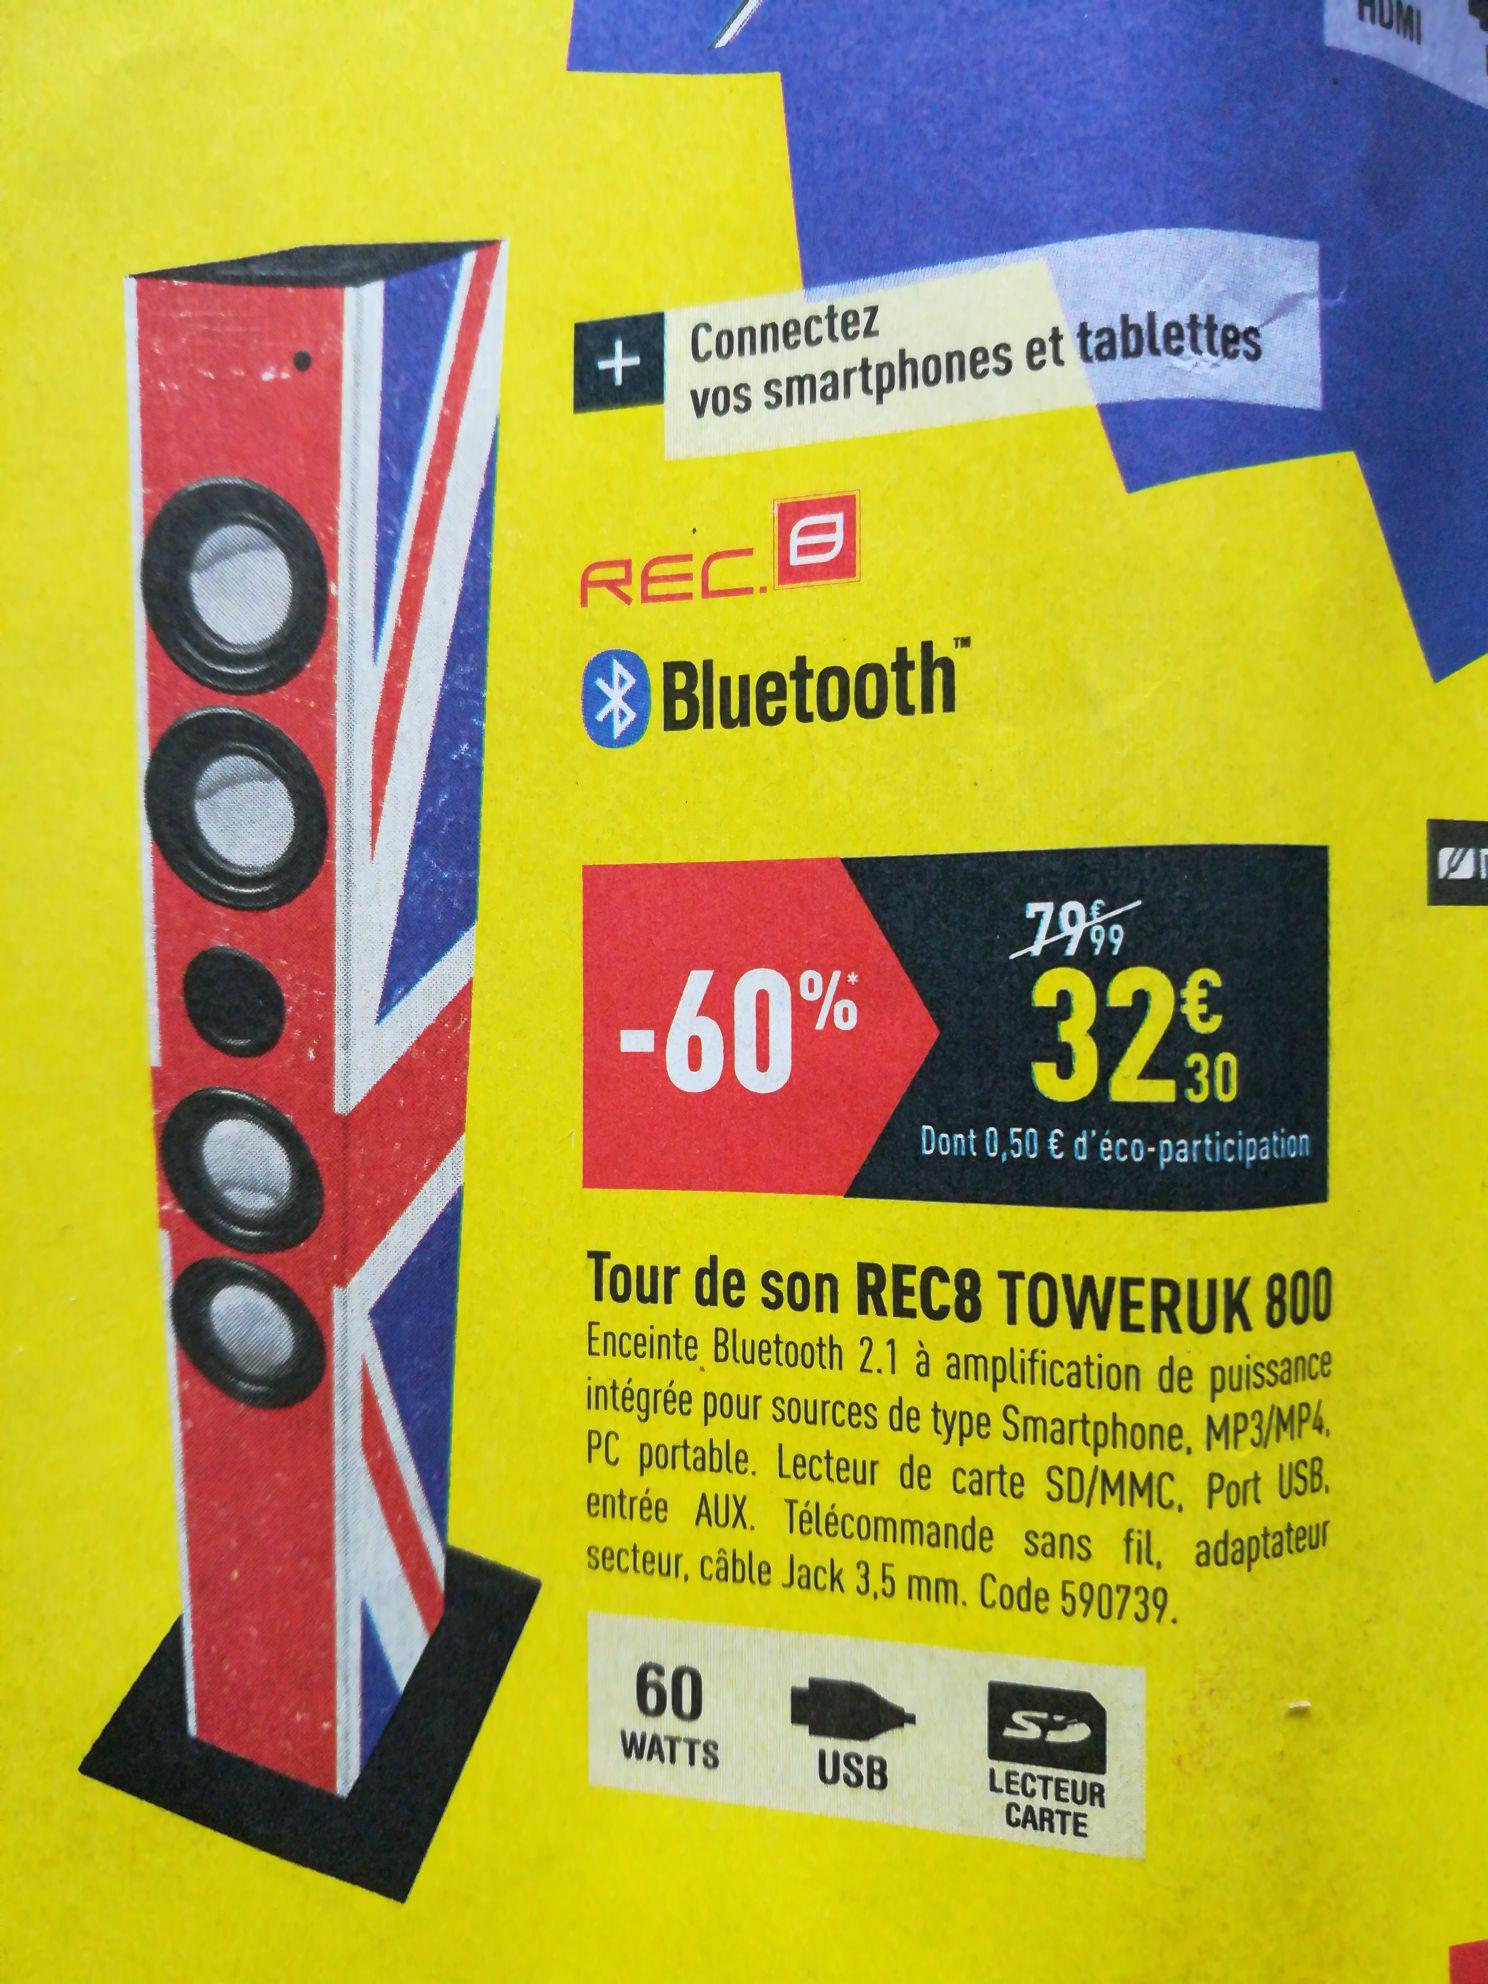 Tour de son REC8 Toweruk 800 - Bluetooth